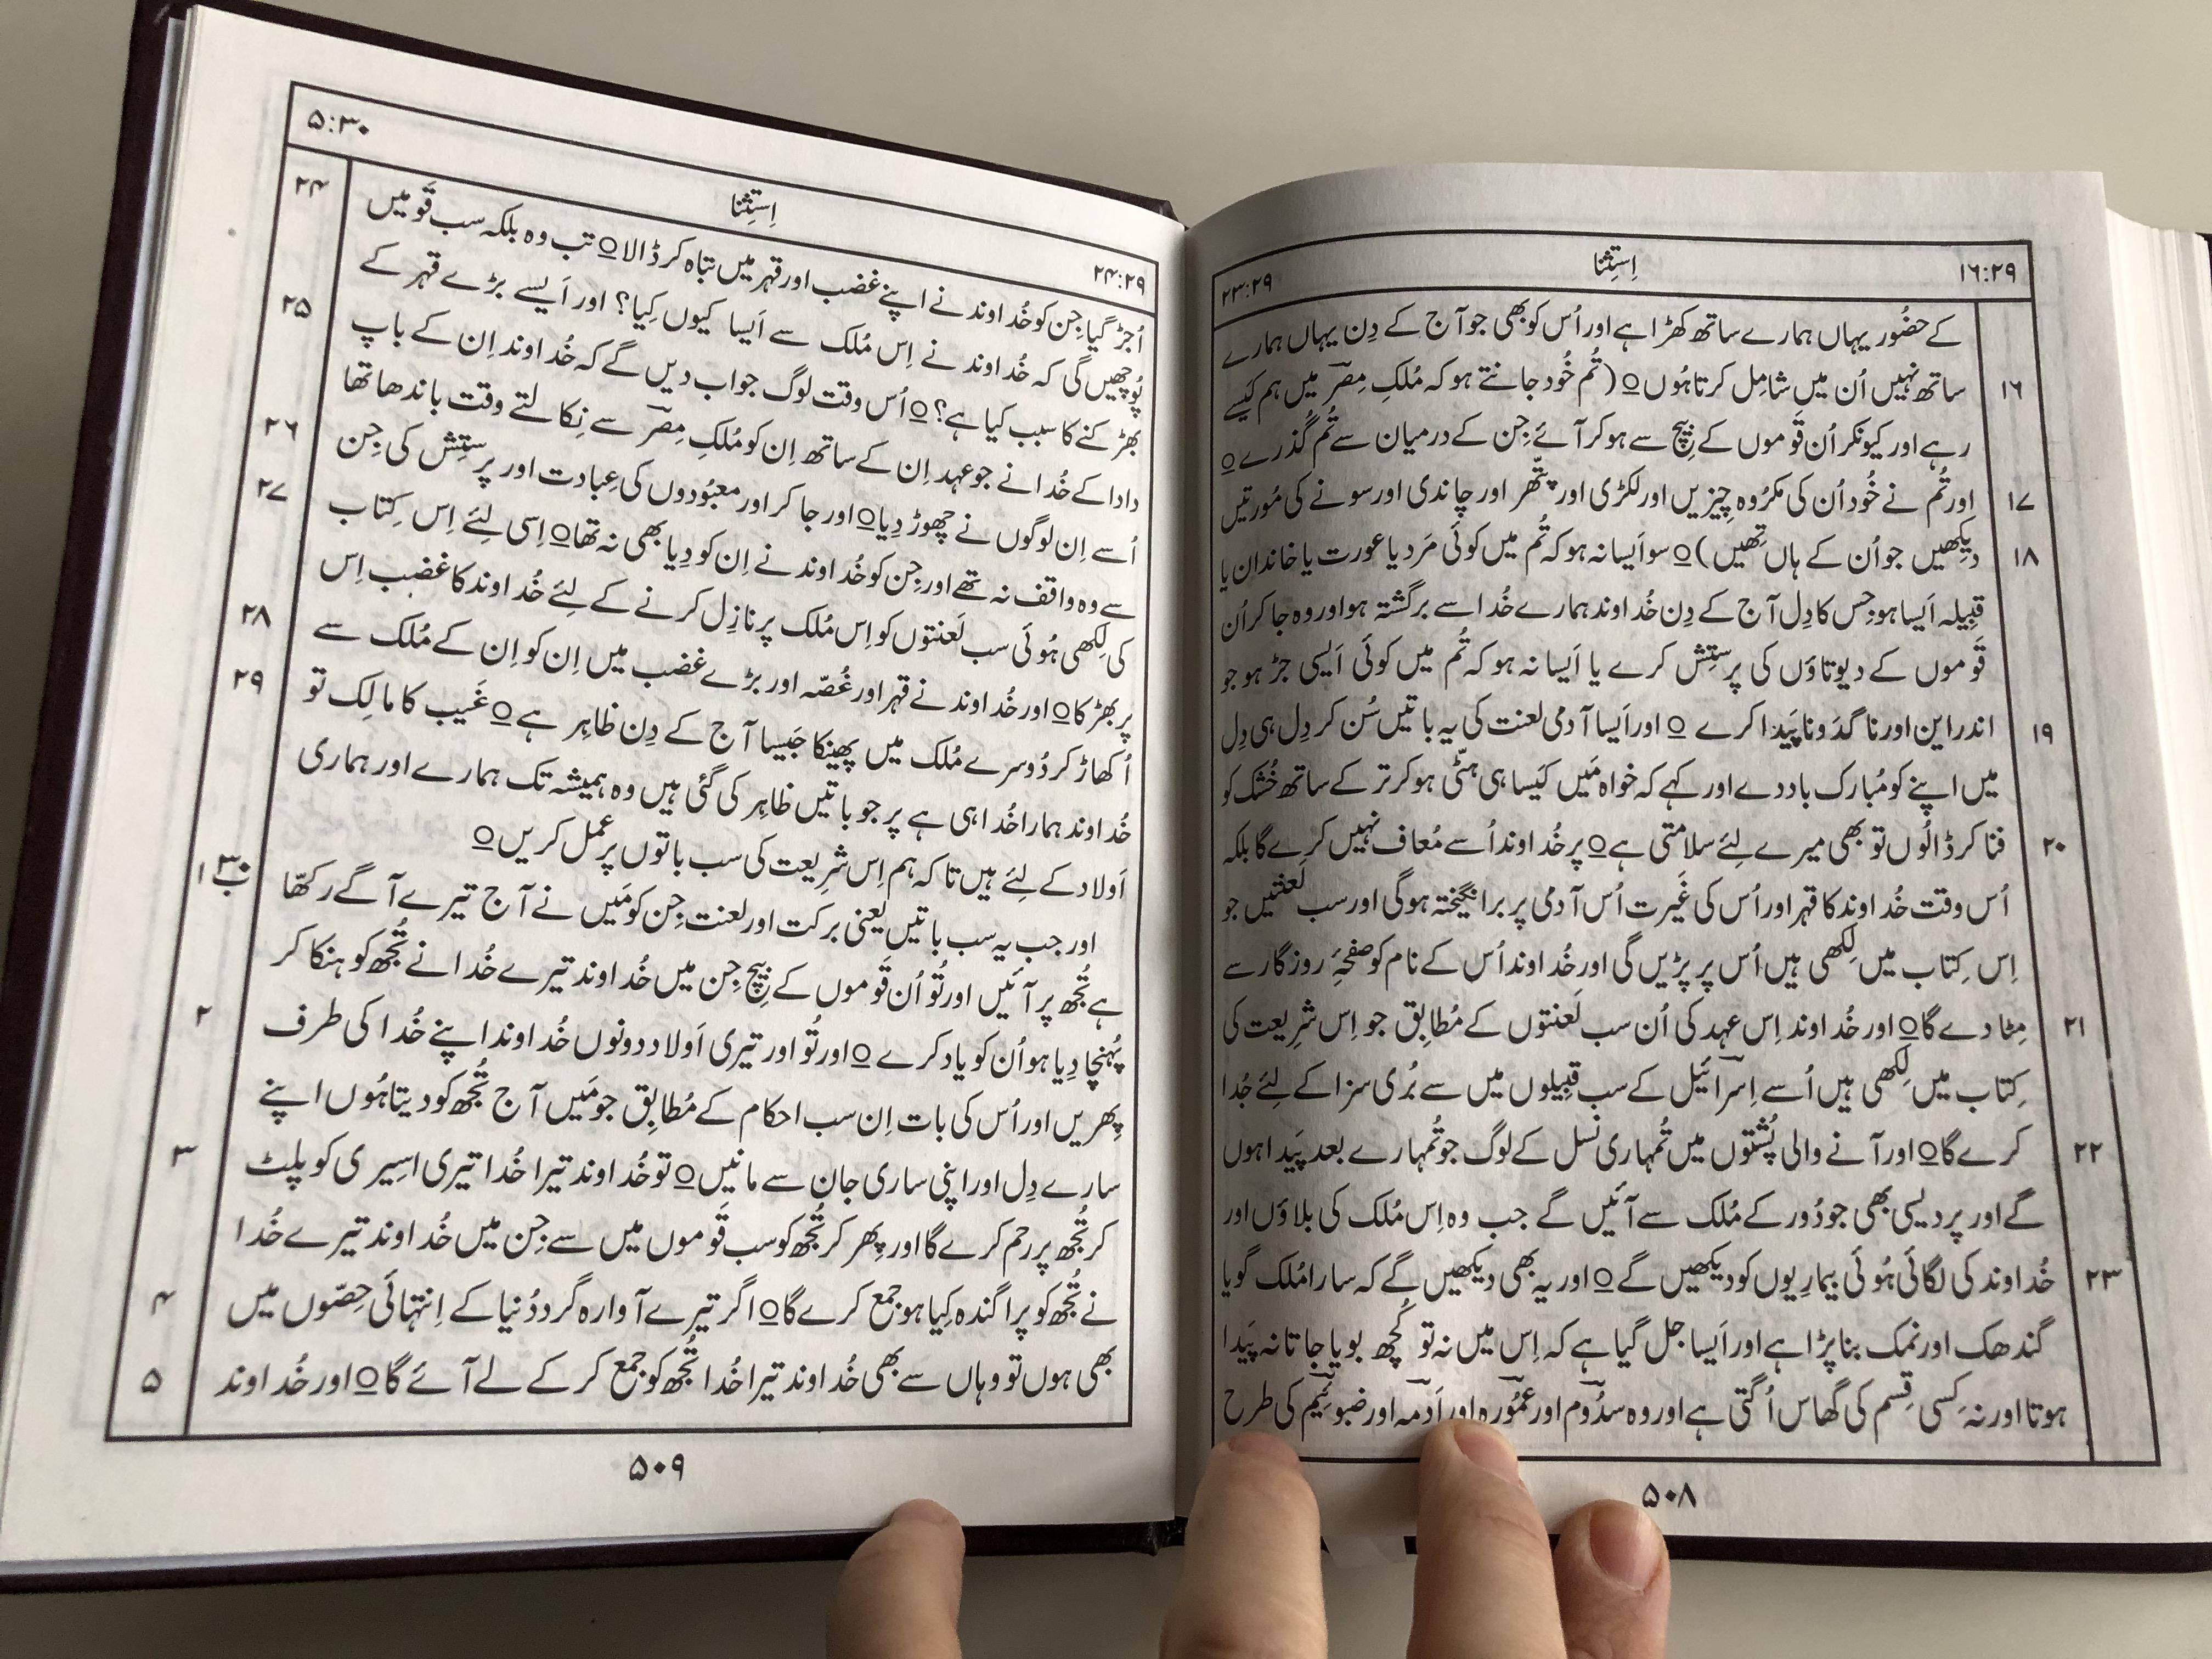 pentateuch-in-urdu-language-7-.jpg